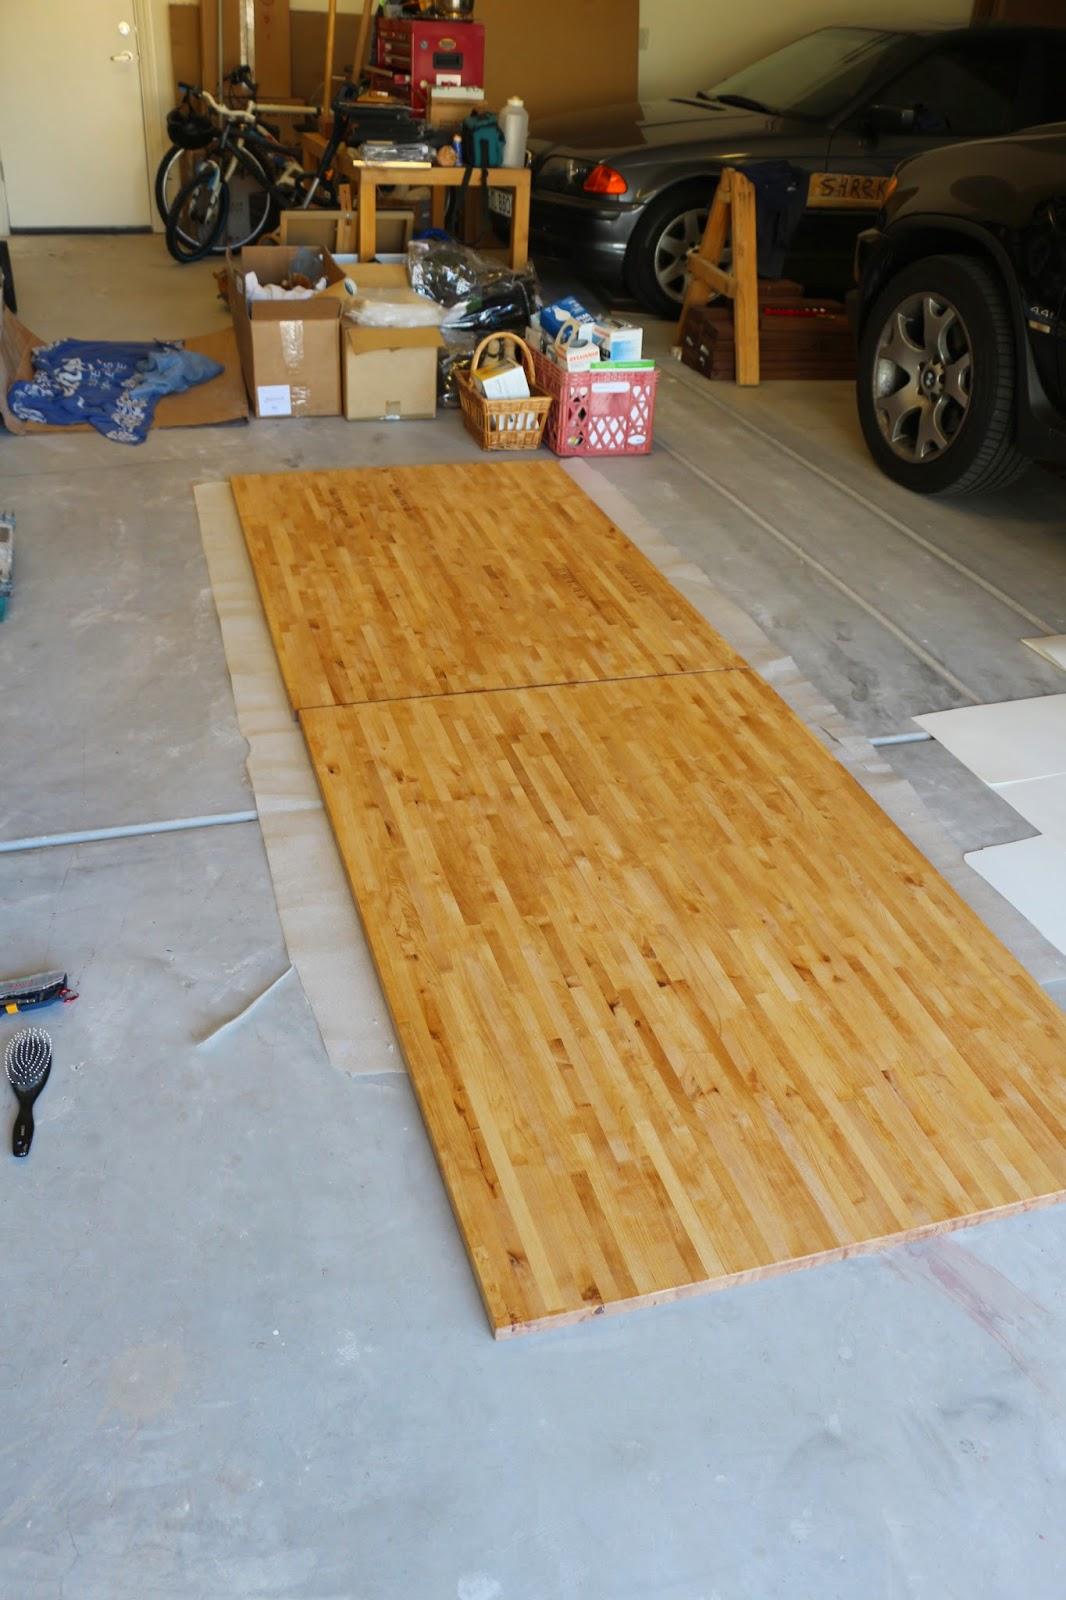 ikea countertop, ikea varde countertop, diy wood countertop